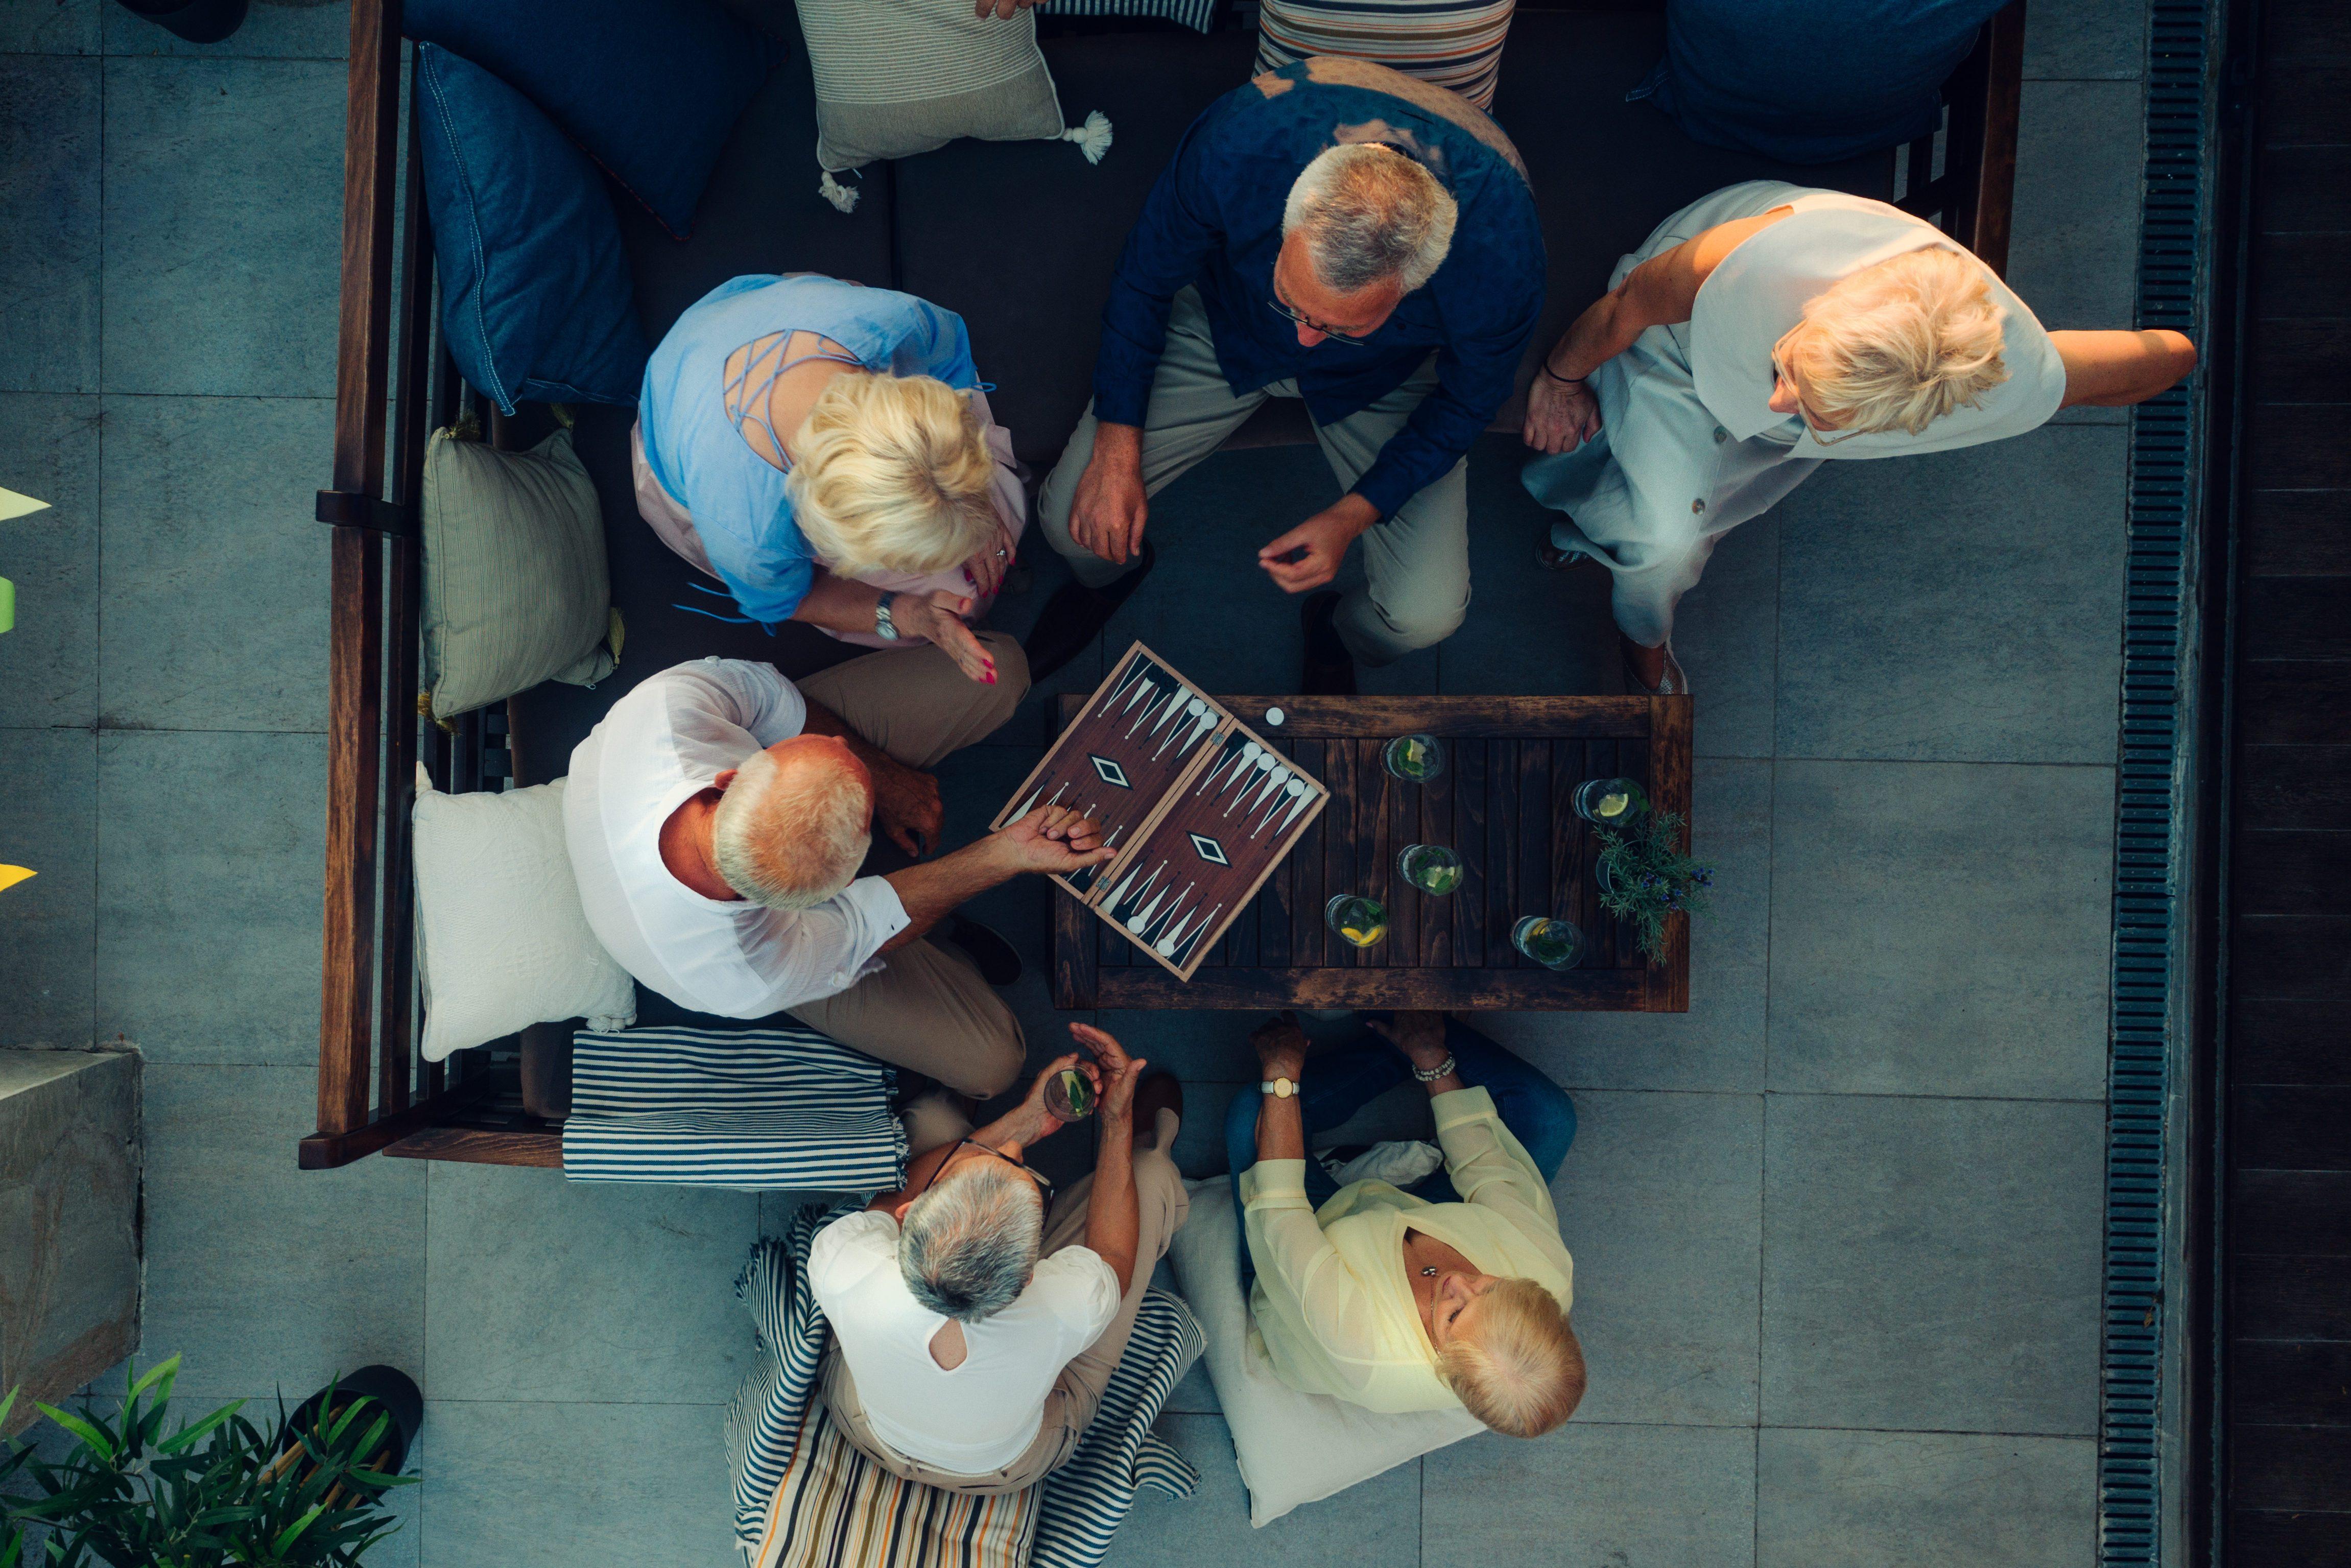 Senior Friends Playing Backgammon